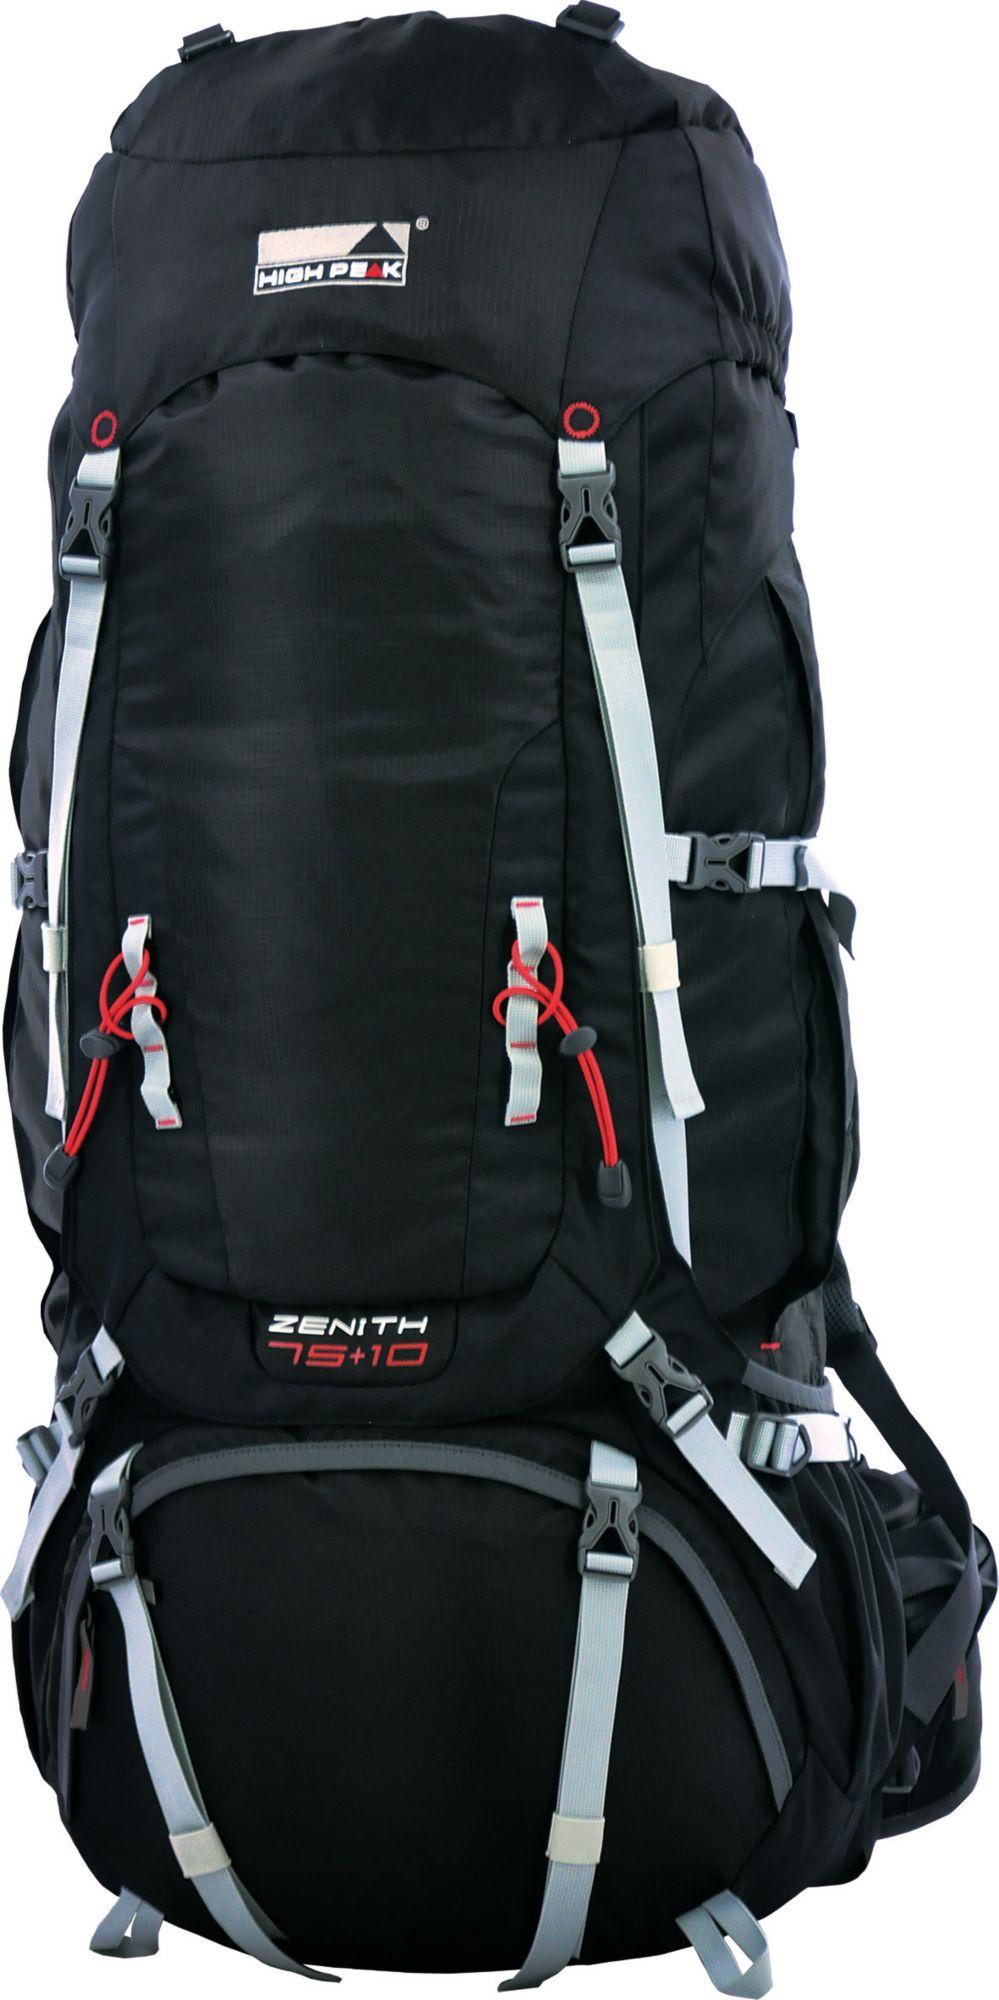 HIGH PEAK Backpack Zenith 75+10, Rucksack